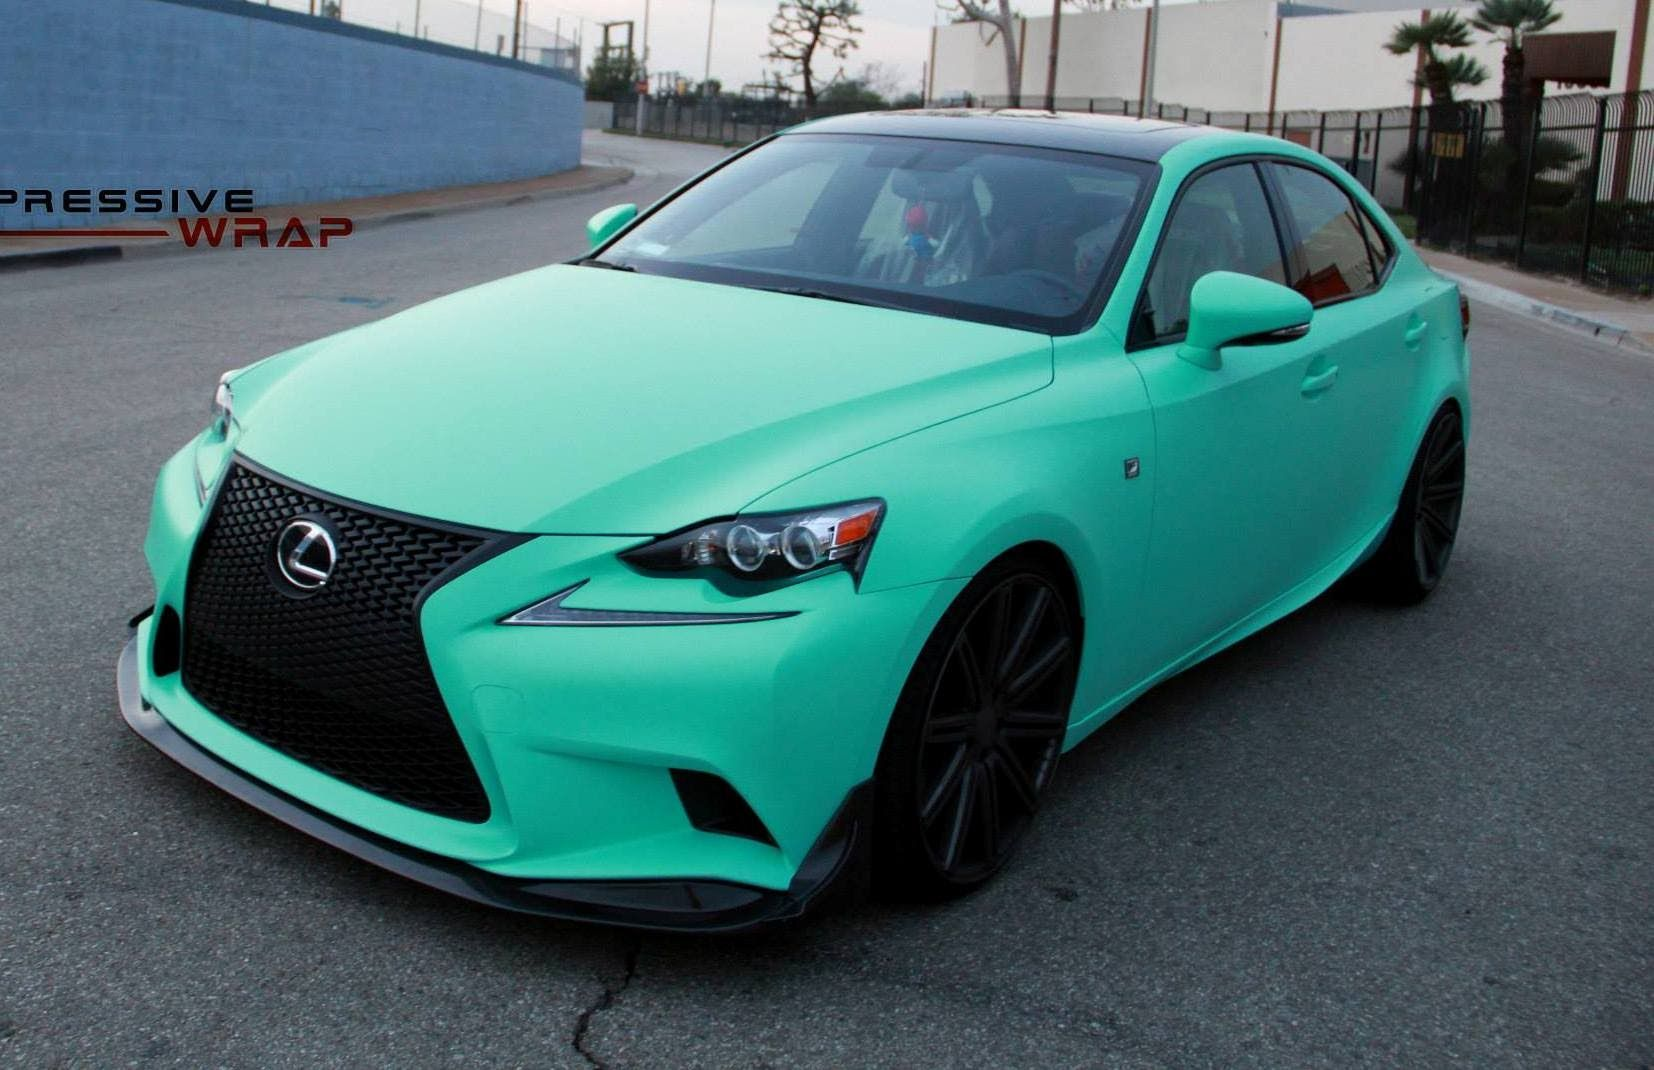 Lexus IS by Impressive Wrap